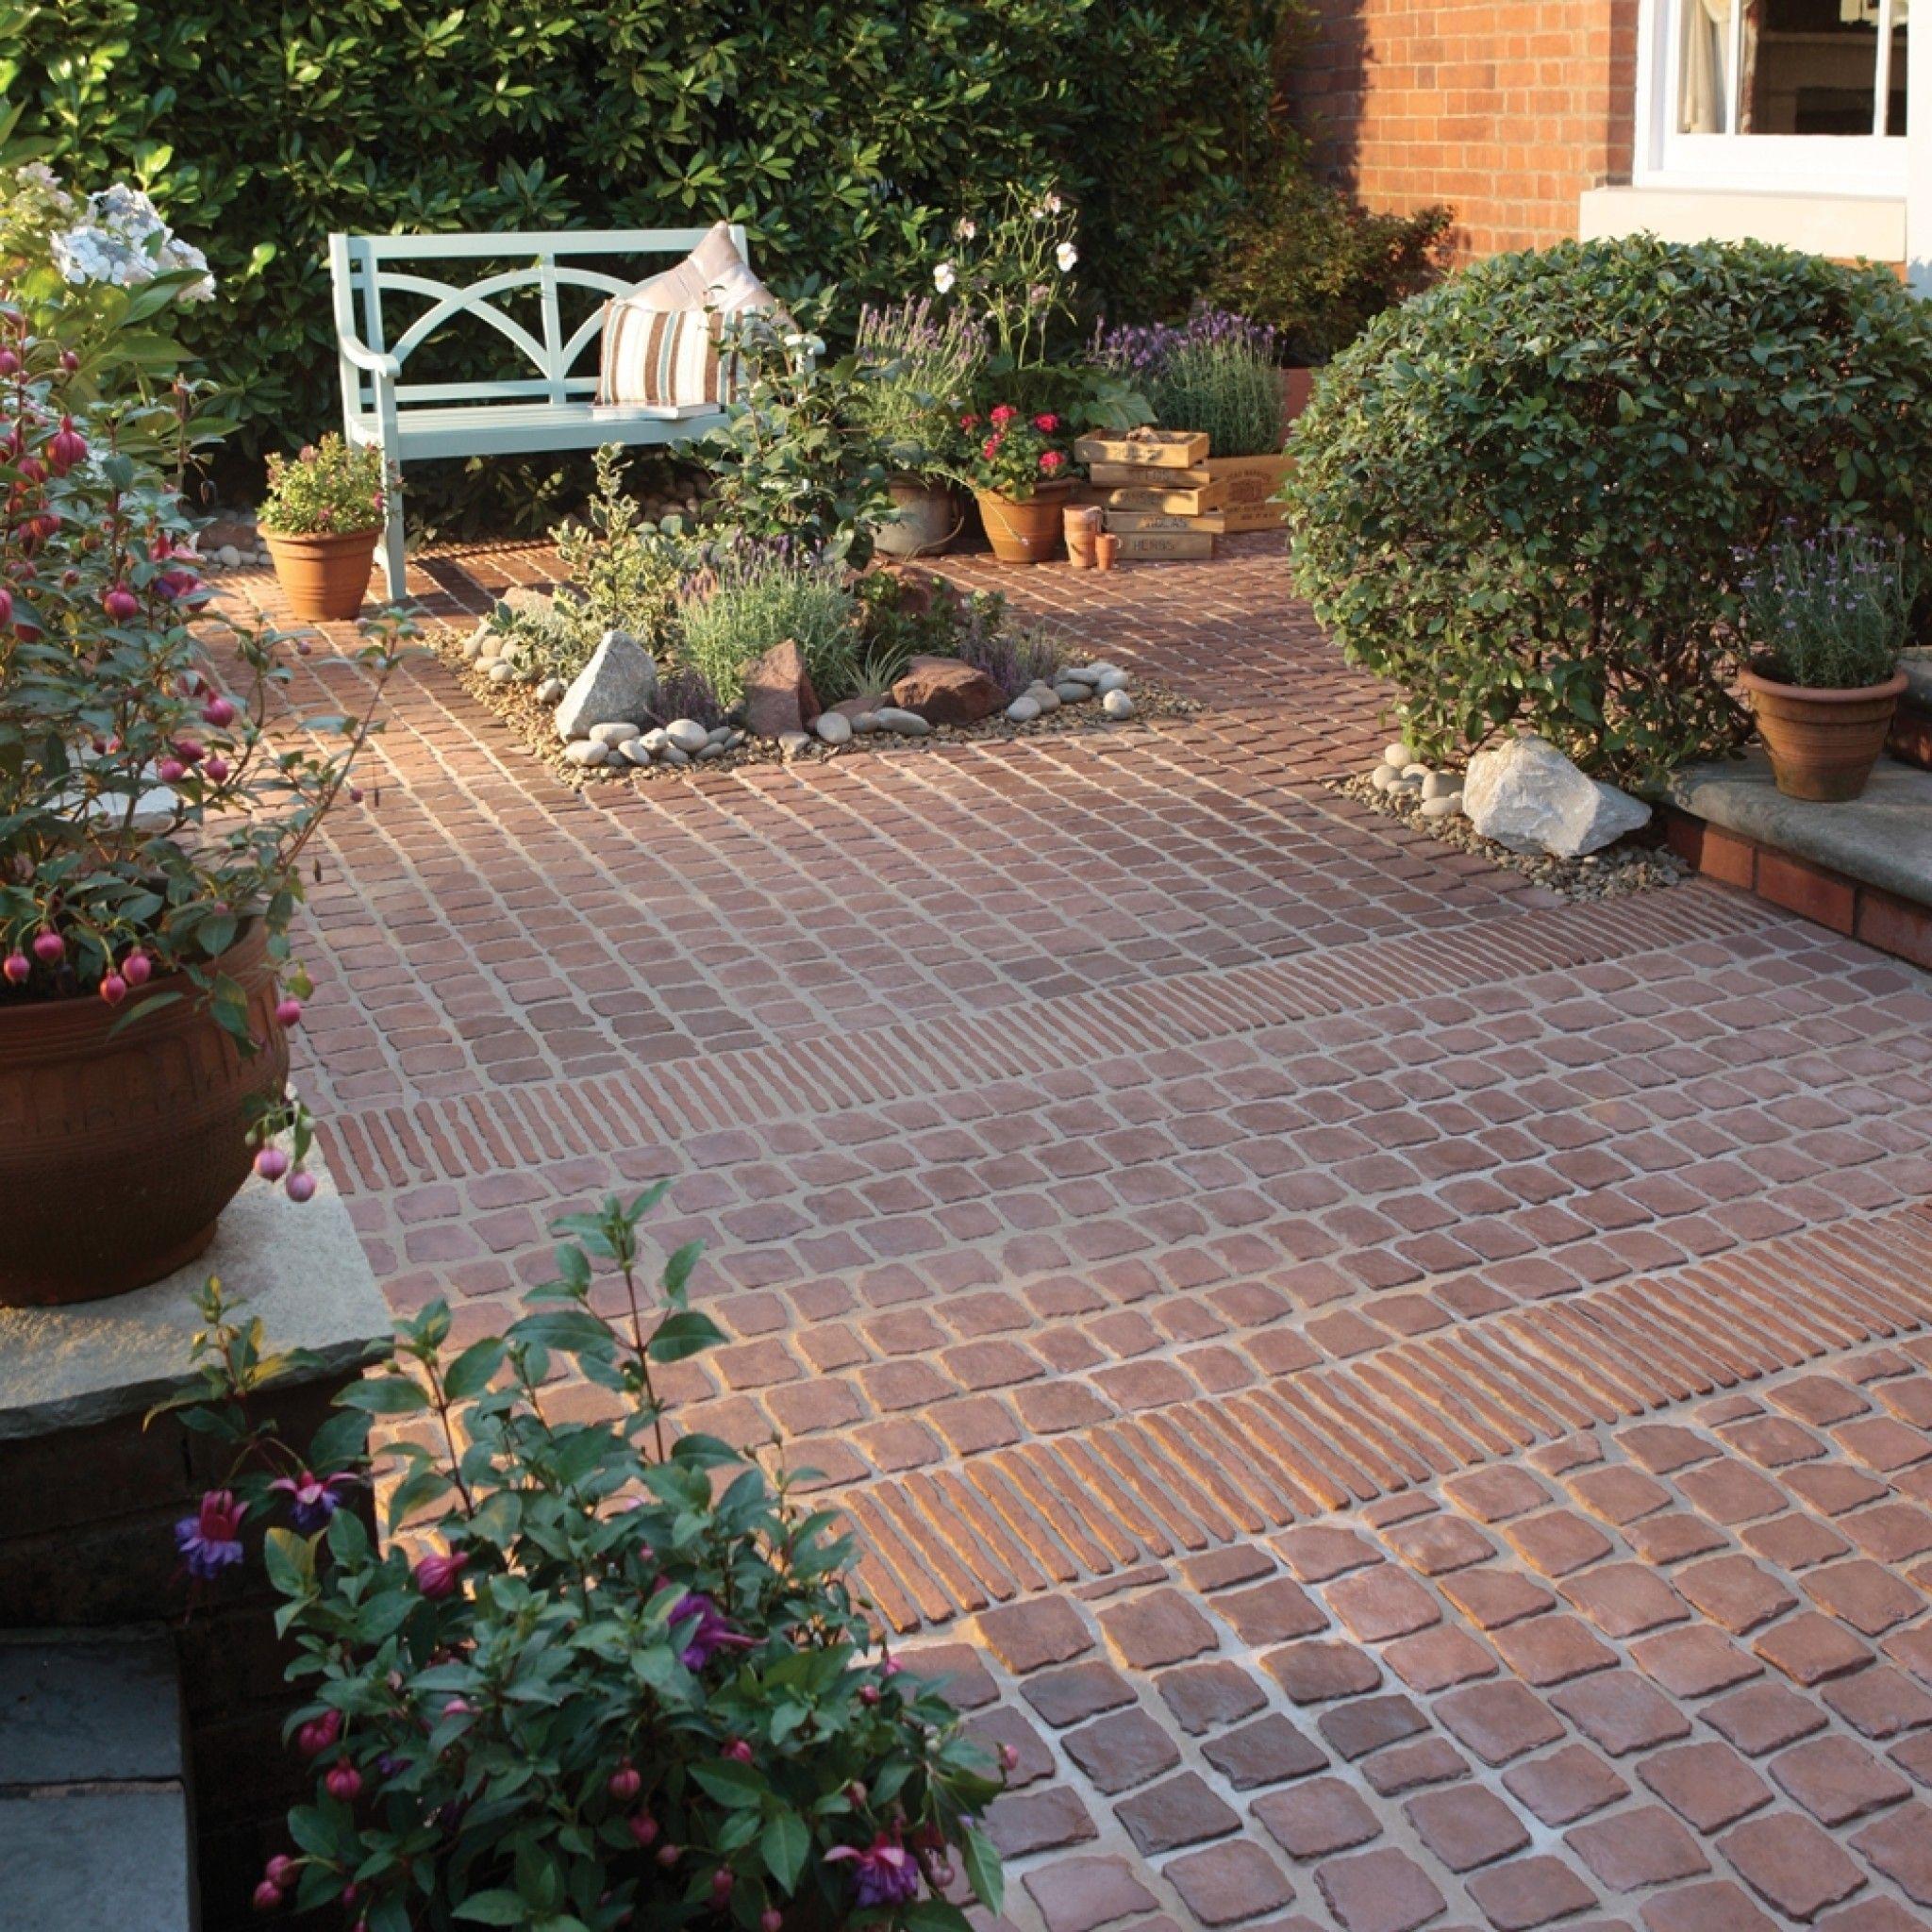 Bradstone Carpet Stones In Rustic Red Garden Paving Patio Stones Patio Garden Design